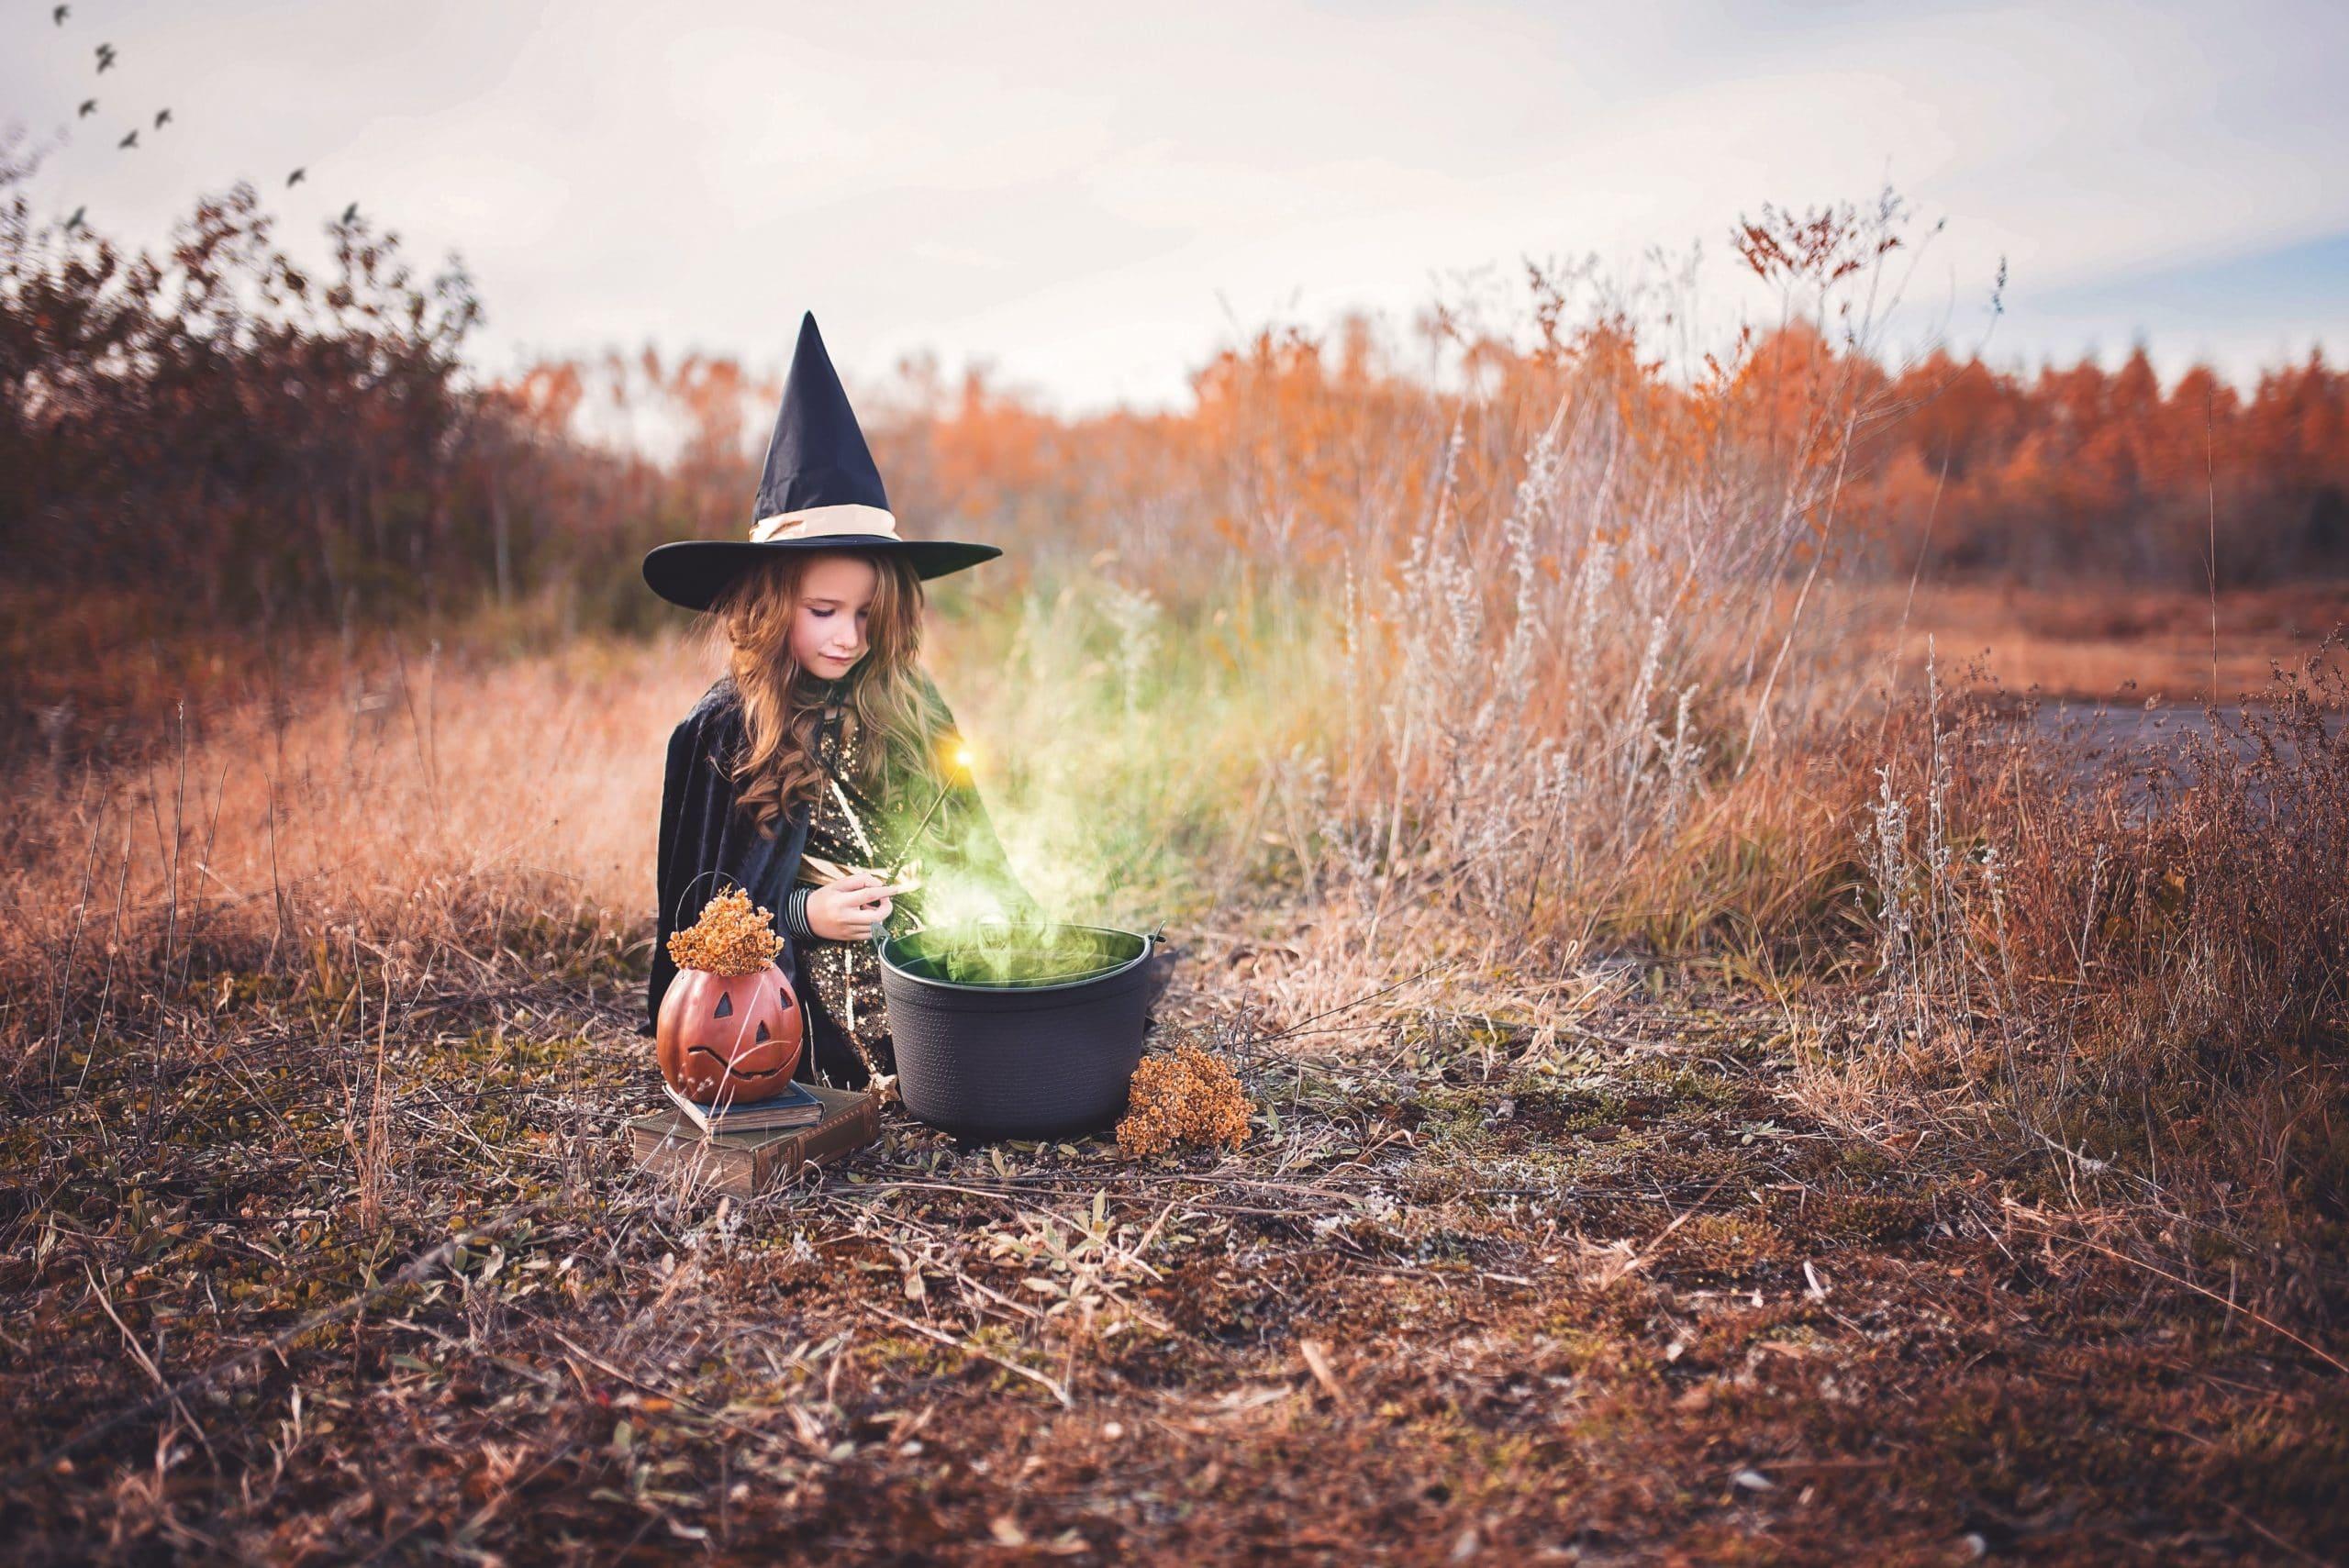 can christian celebrate halloween